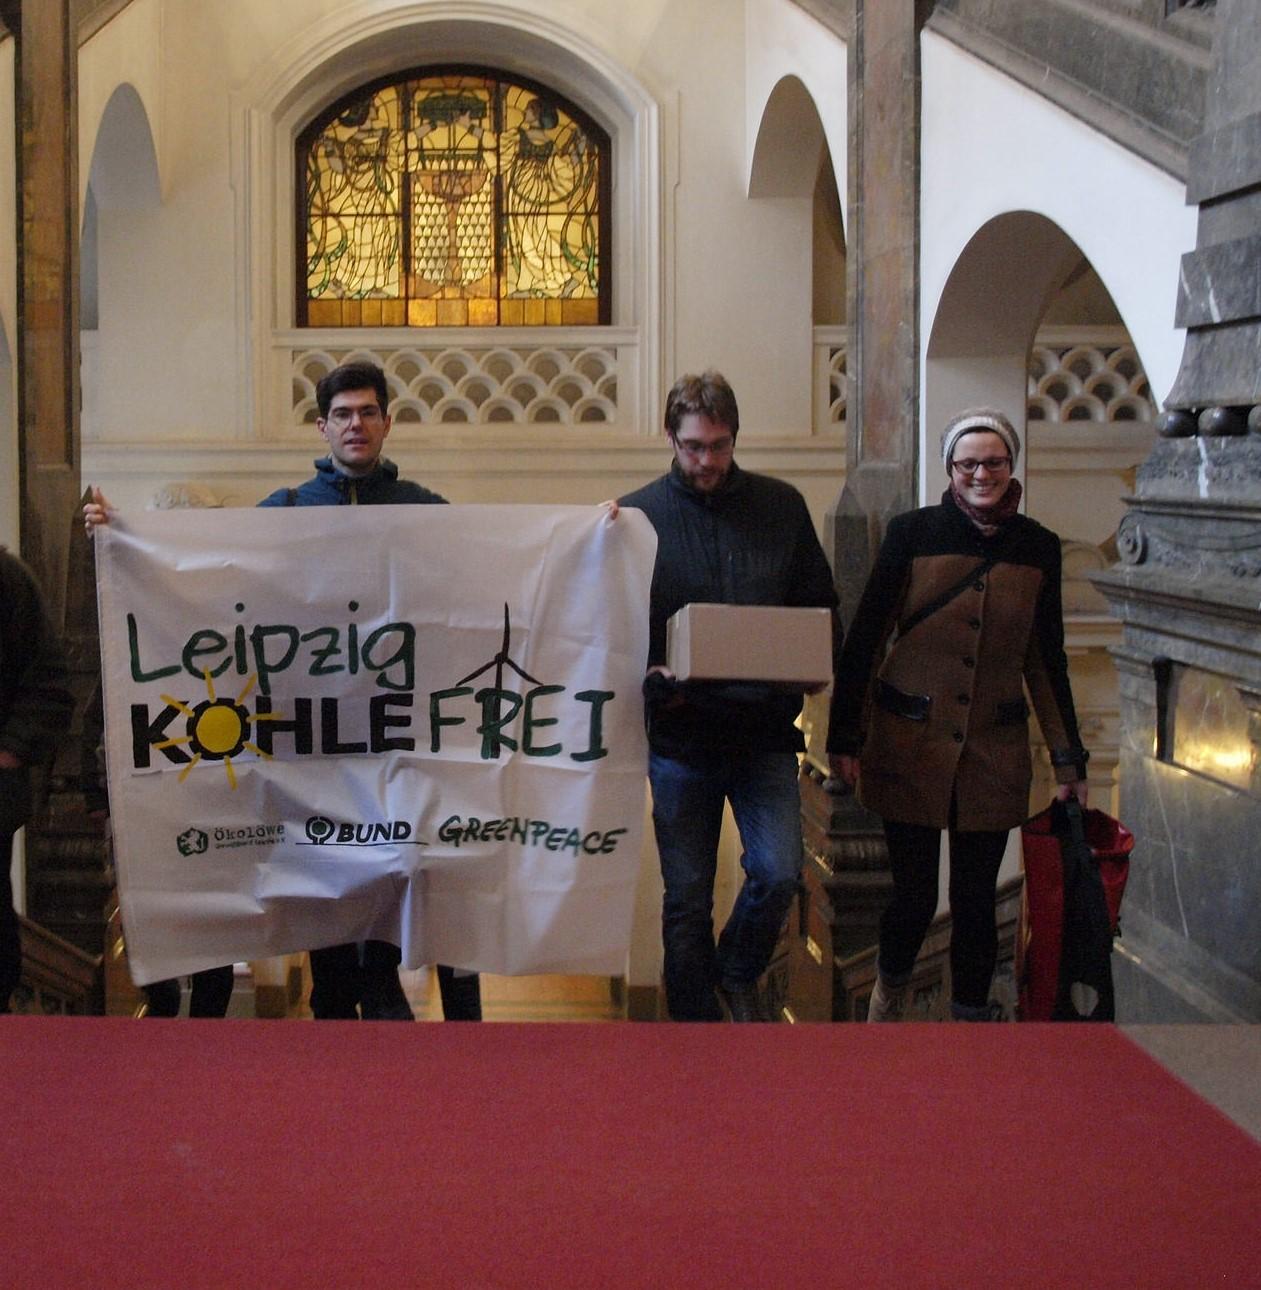 Leipzig kohlefrei